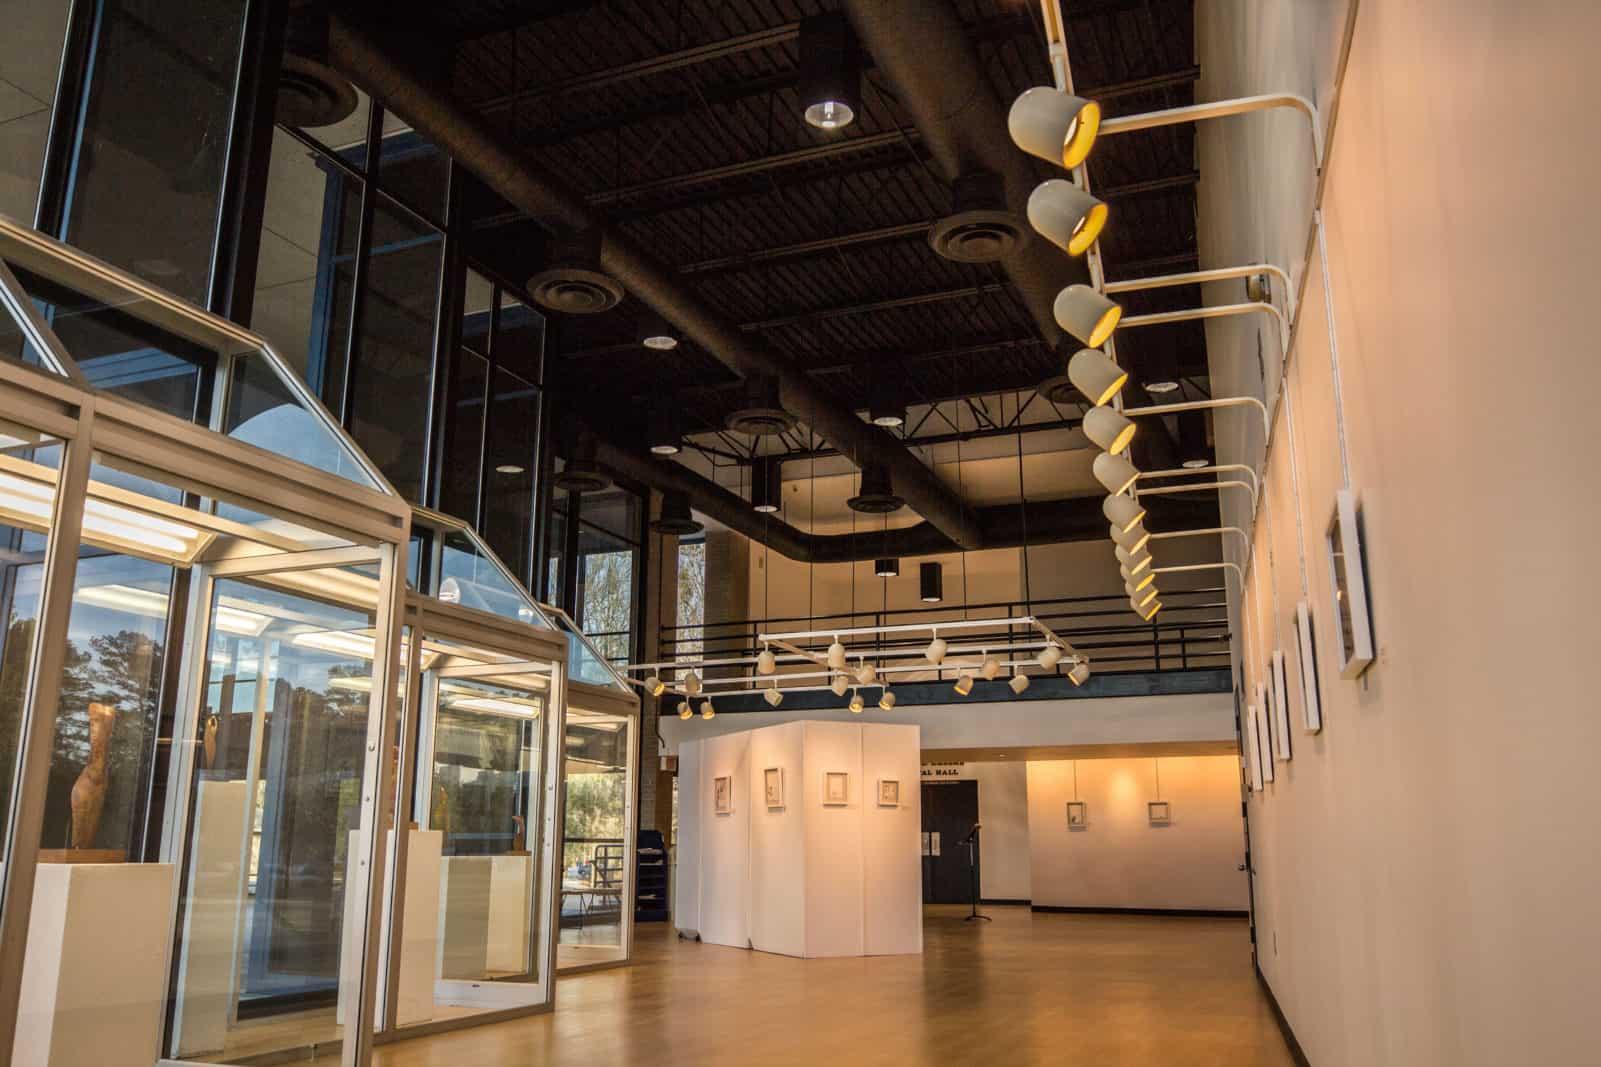 FMU's Hyman Fine Arts Center hosts North and South Carolinian's exhibits